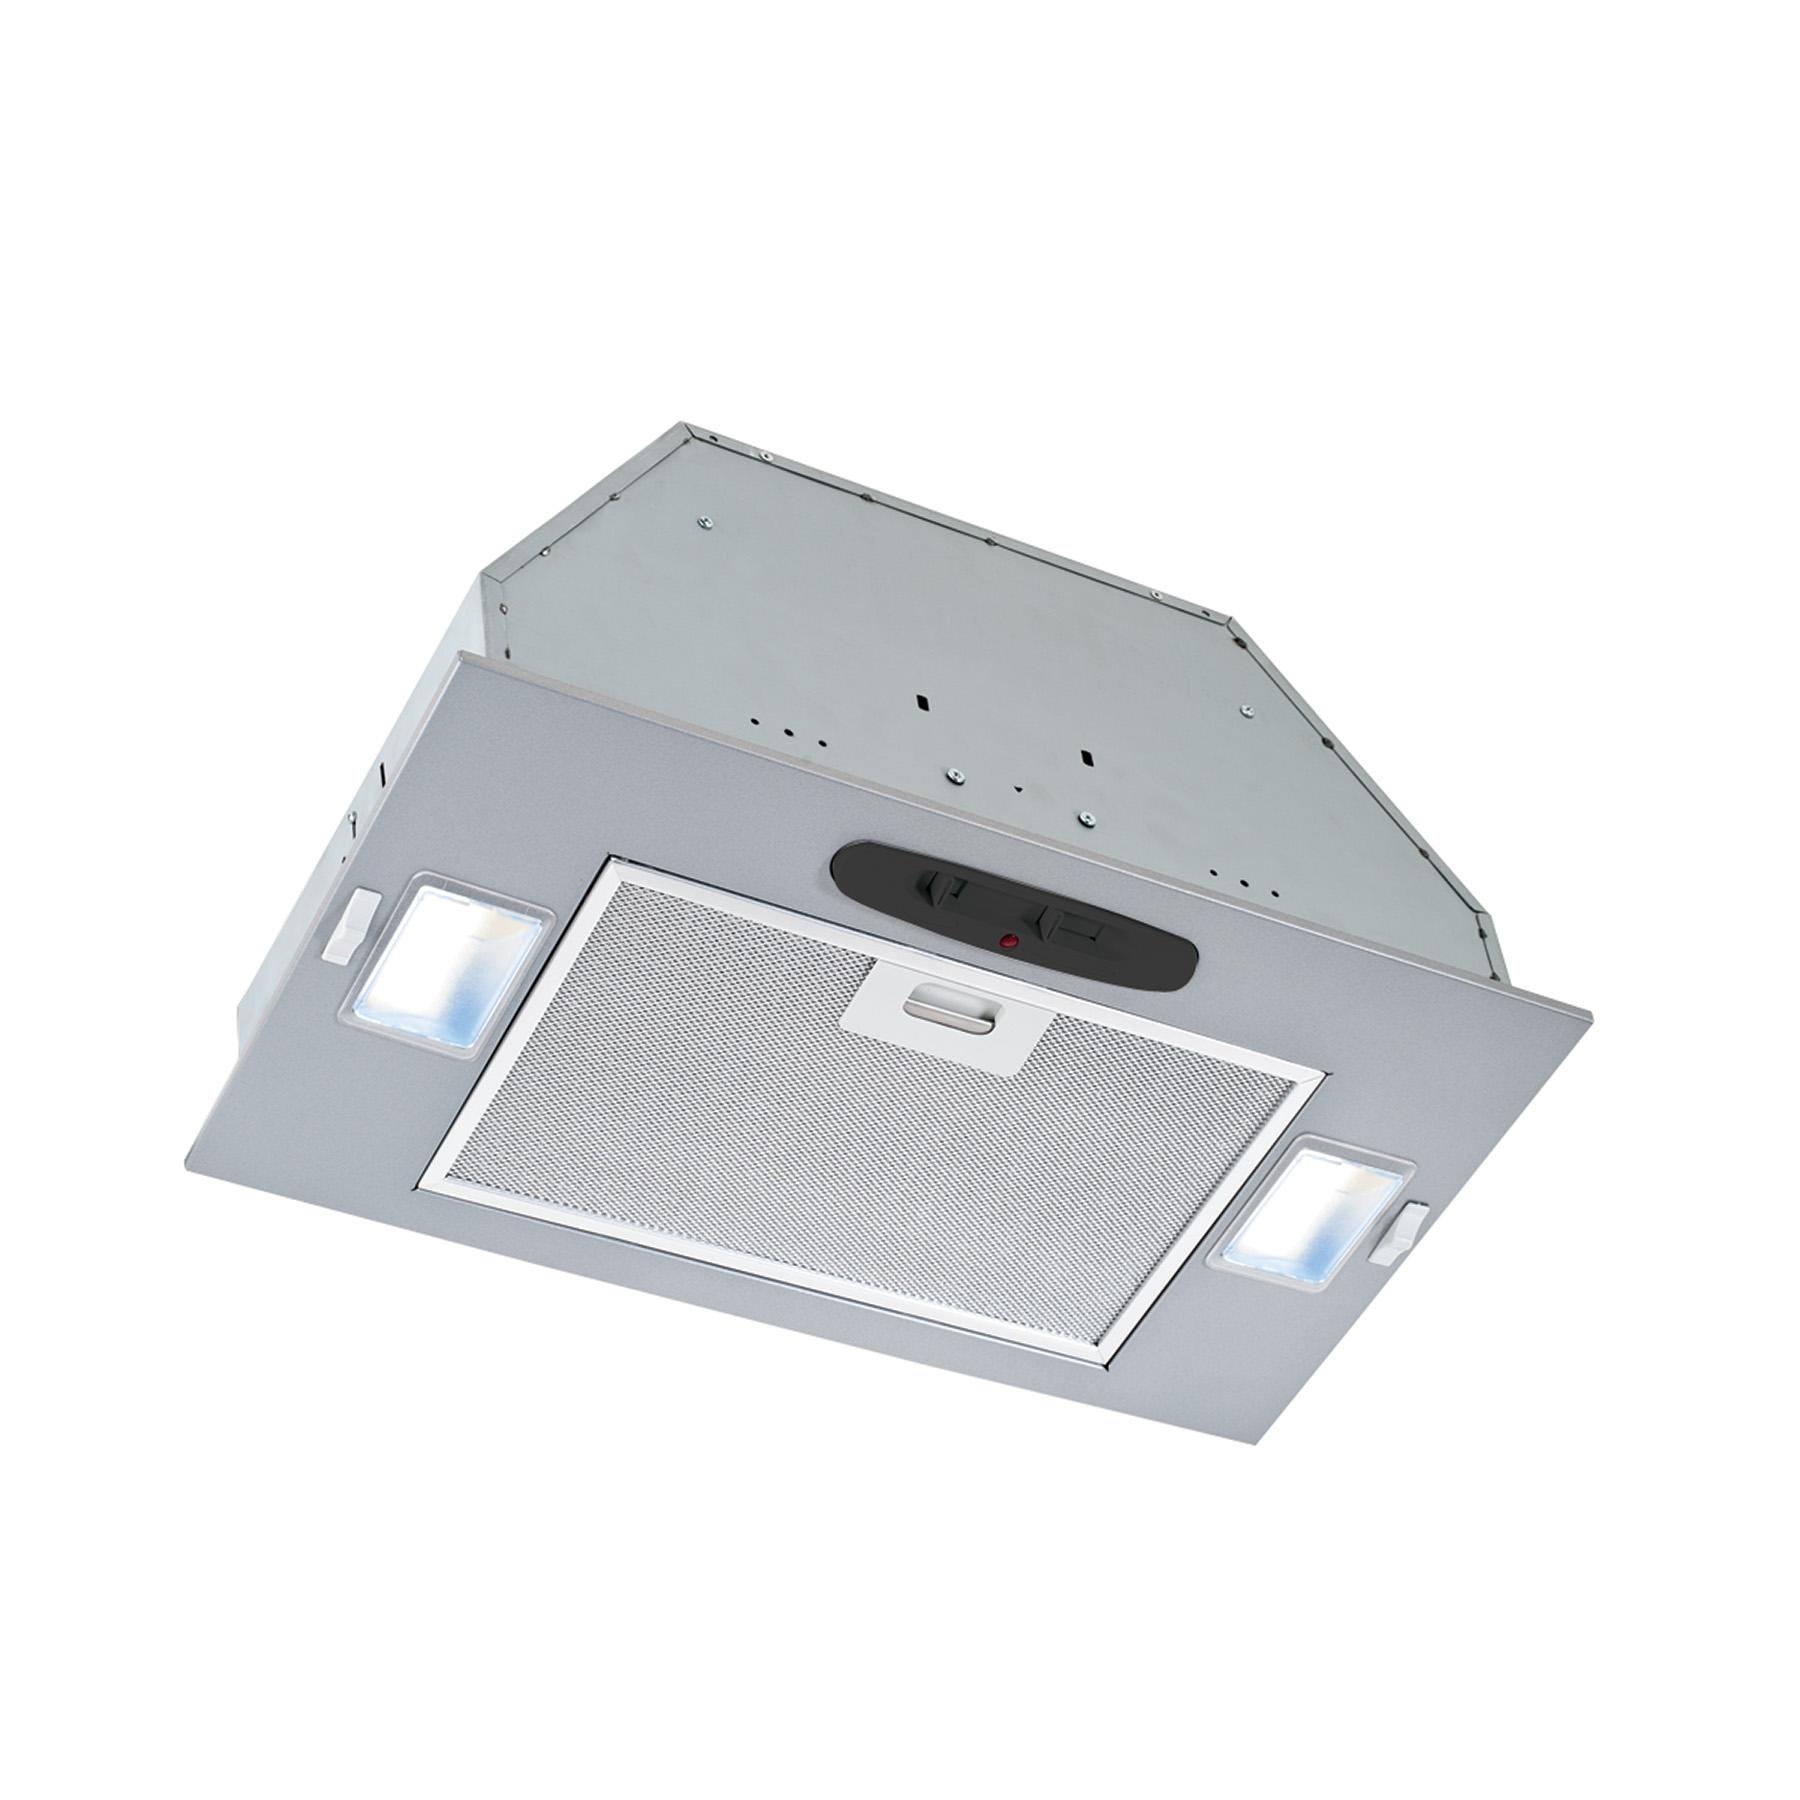 Broan® 20-1/2-Inch Custom Range Hood Power Pack w/ Internal Blower, 290 CFM, ENERGY STAR®